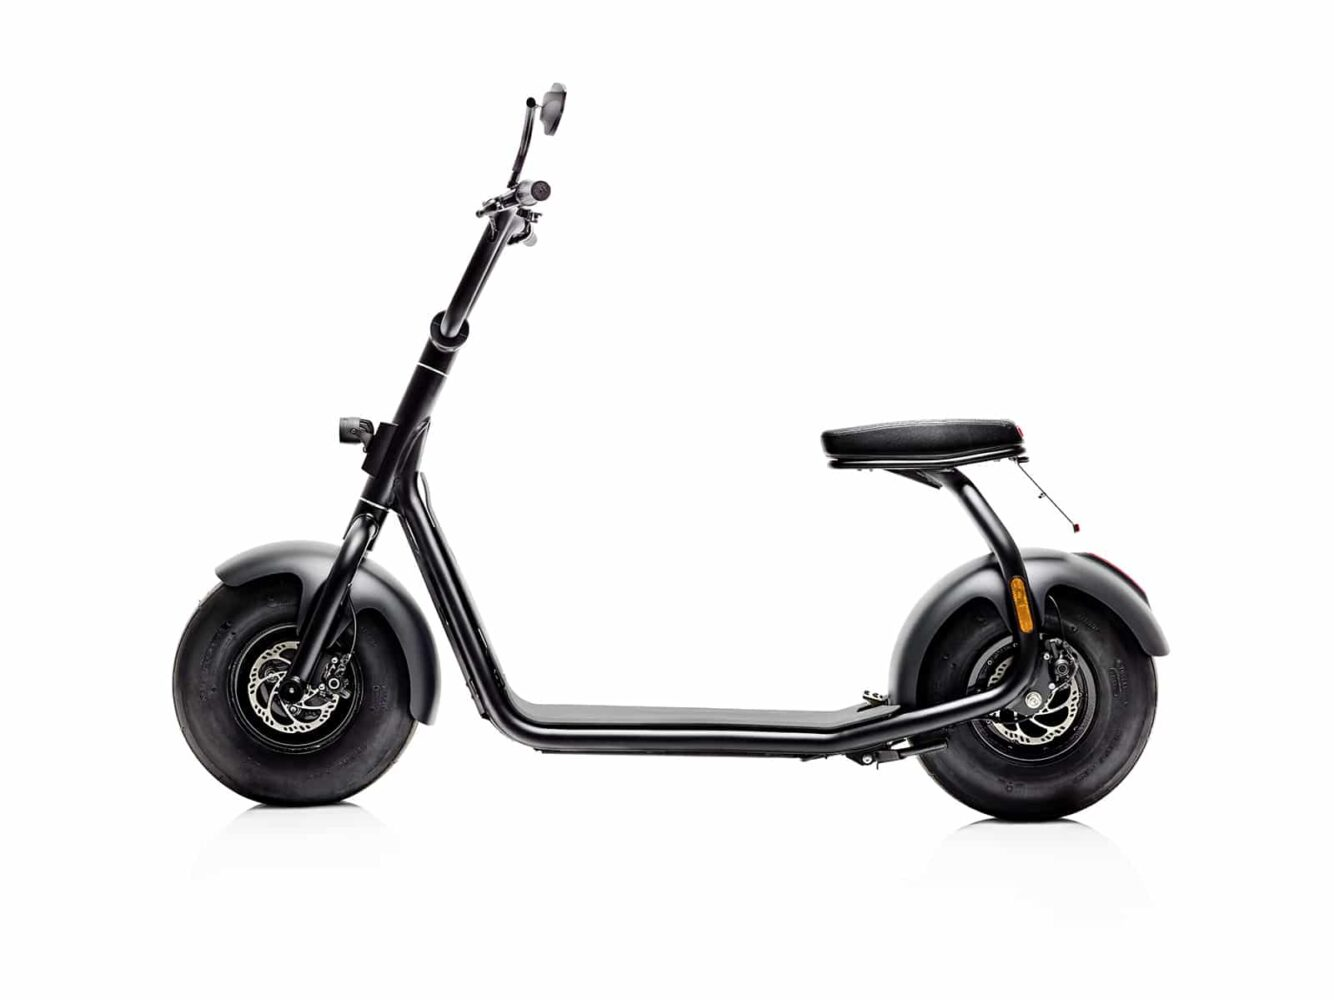 Scrooser - Elcykel scooter i Sverige